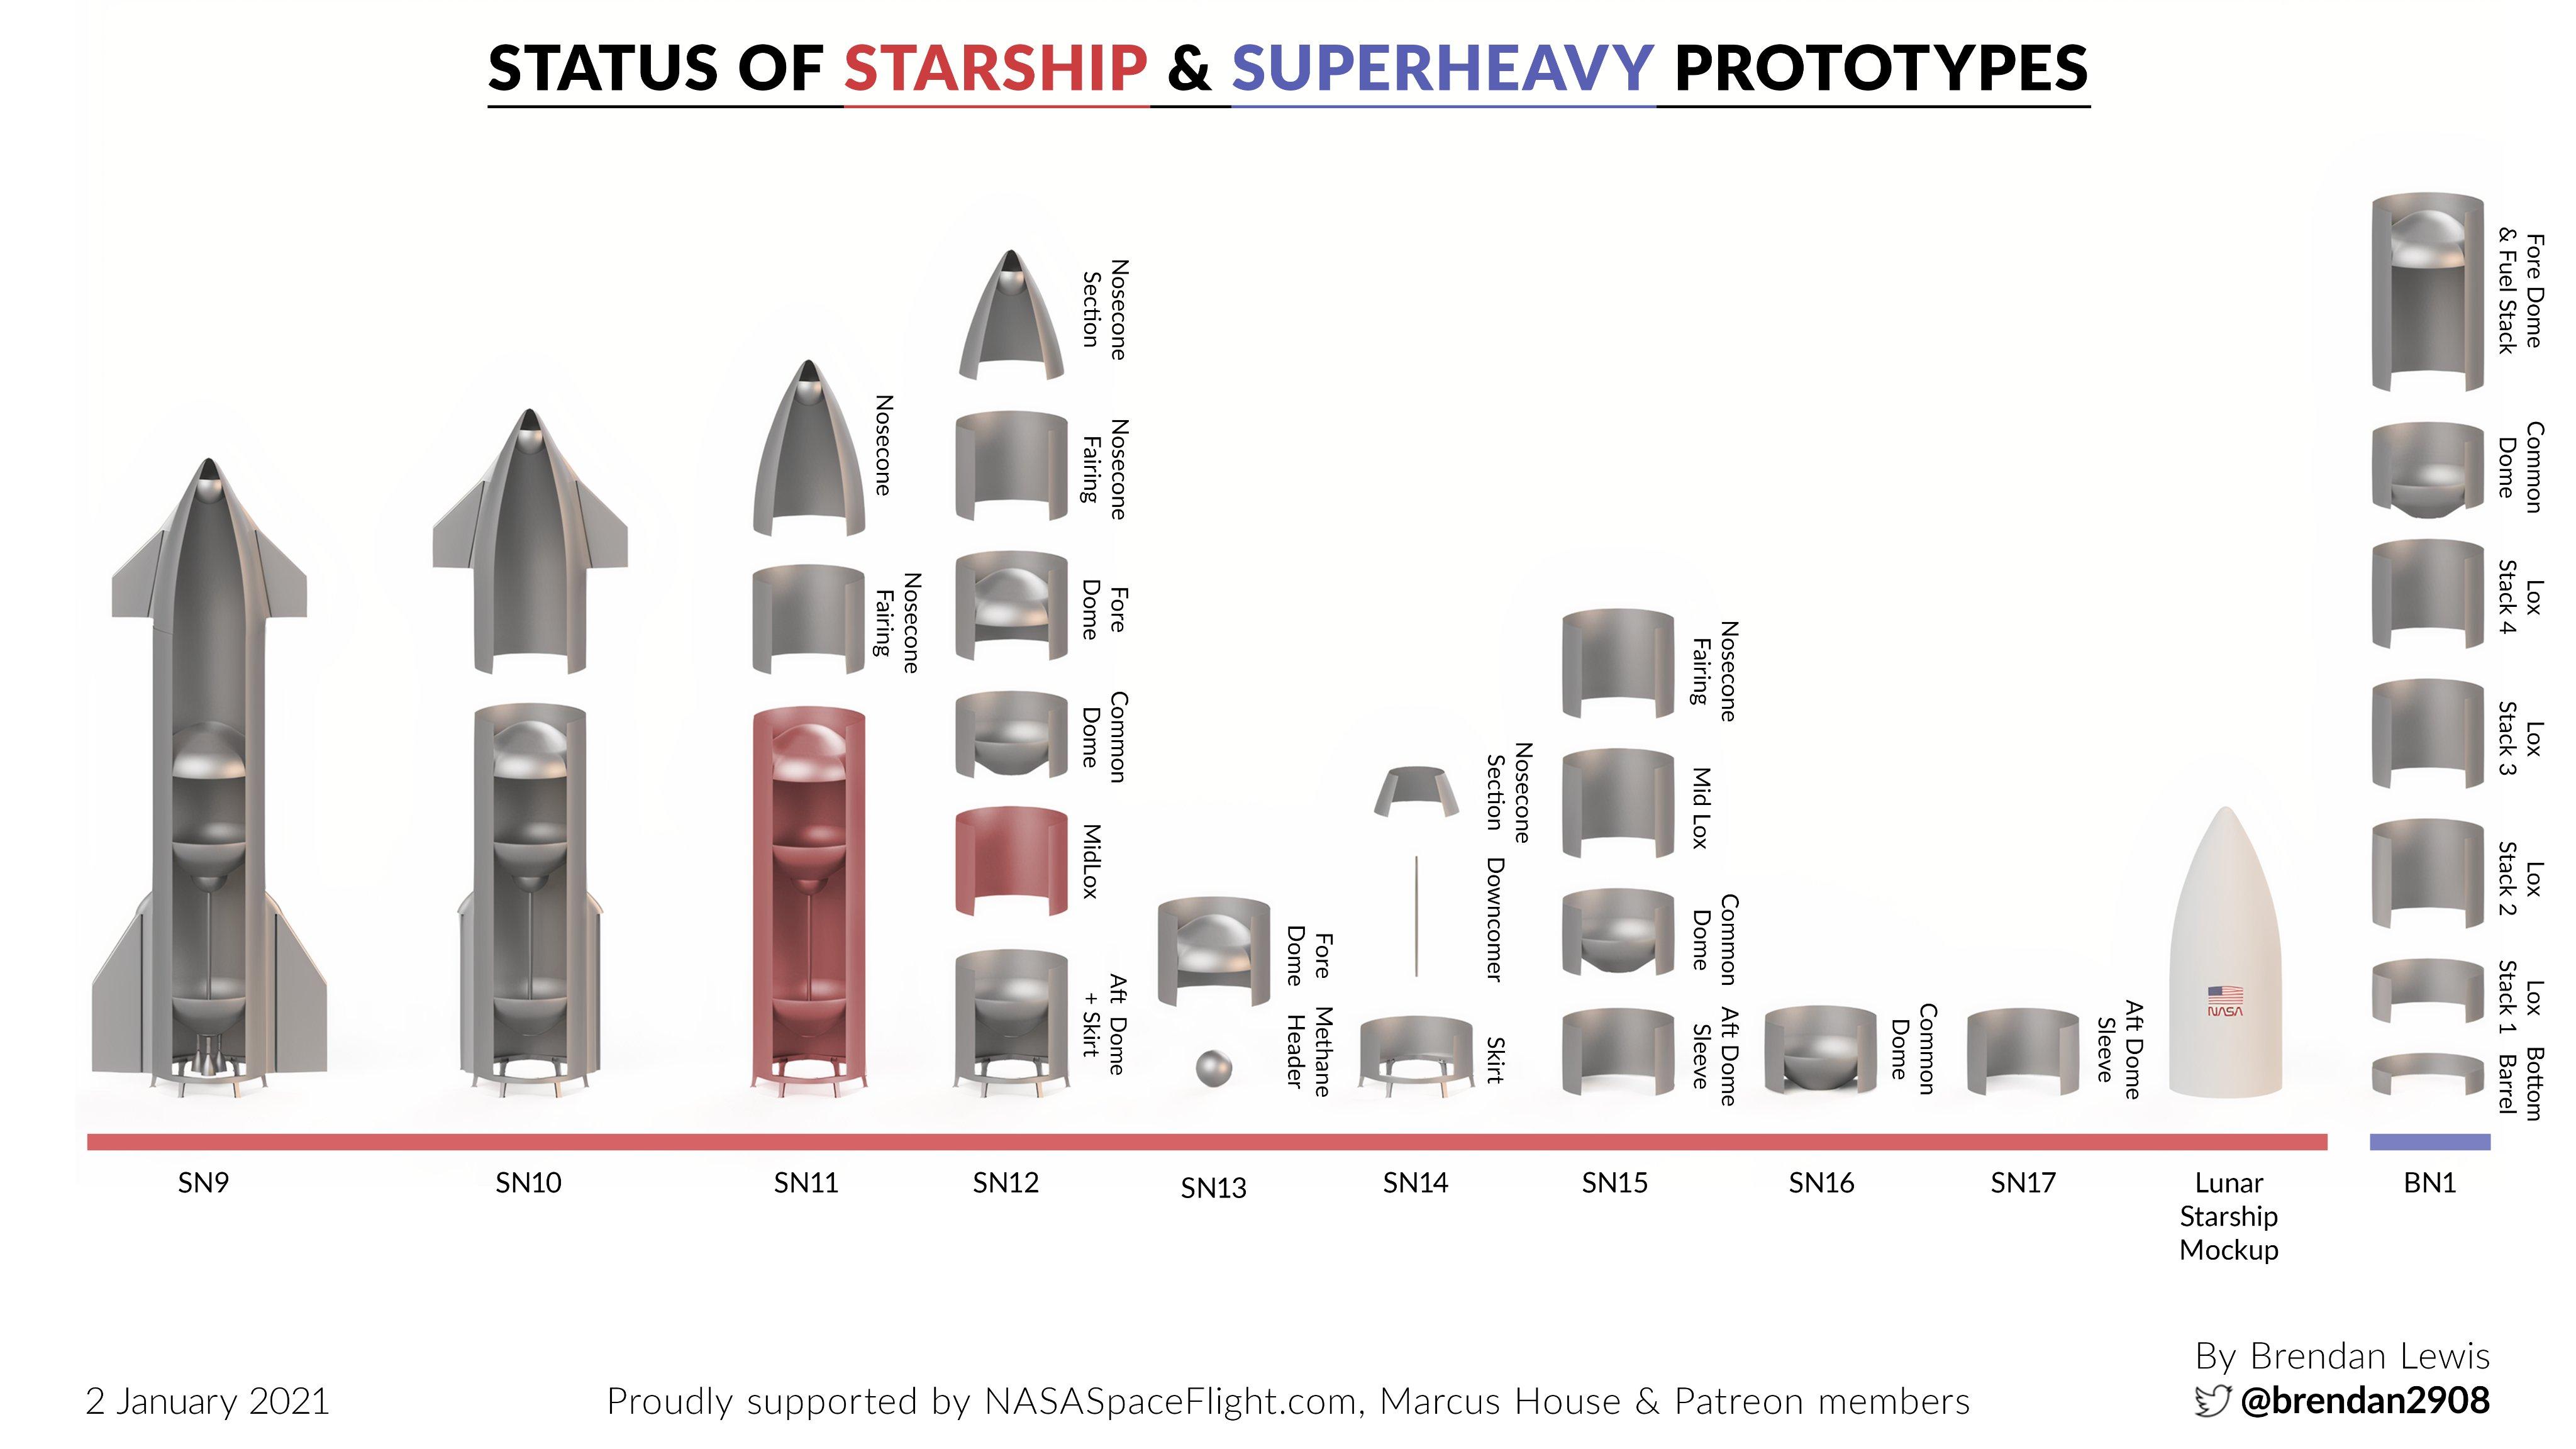 Point de situation des Starship & Superheavy 11693